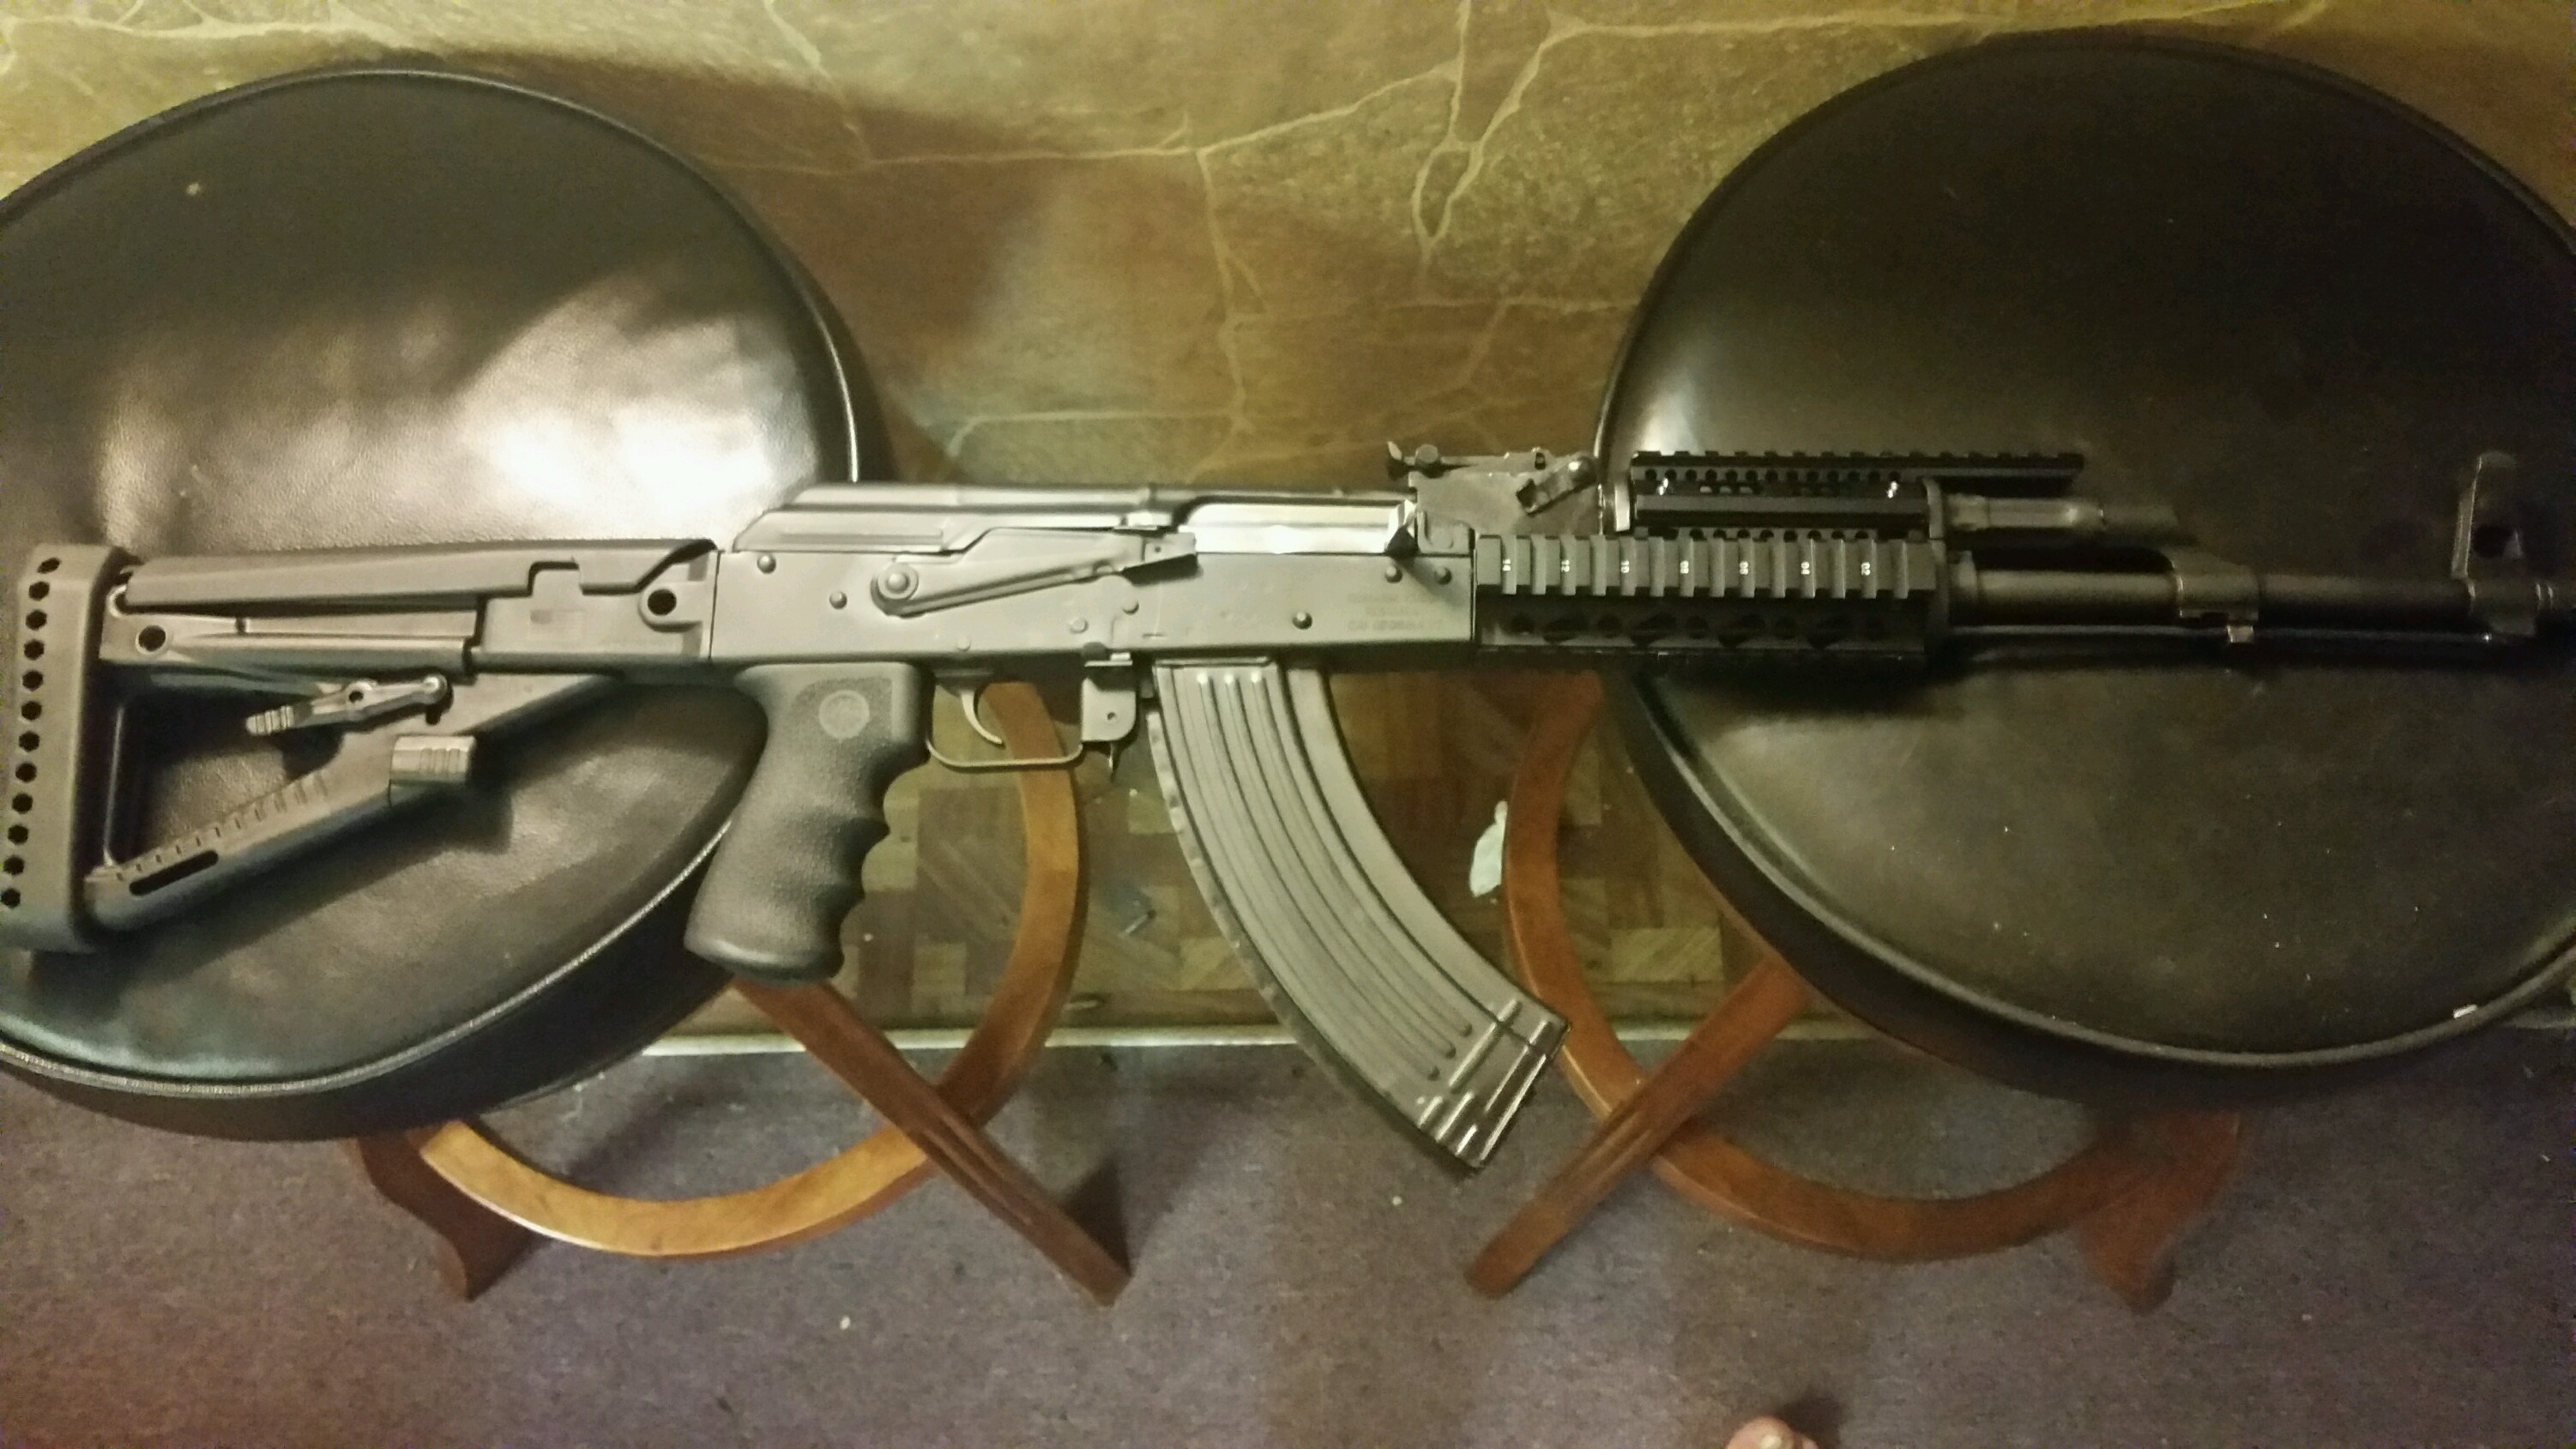 Pro Mag AA123 Archangel OPFOR AK Series Buttstock, Black Polymer